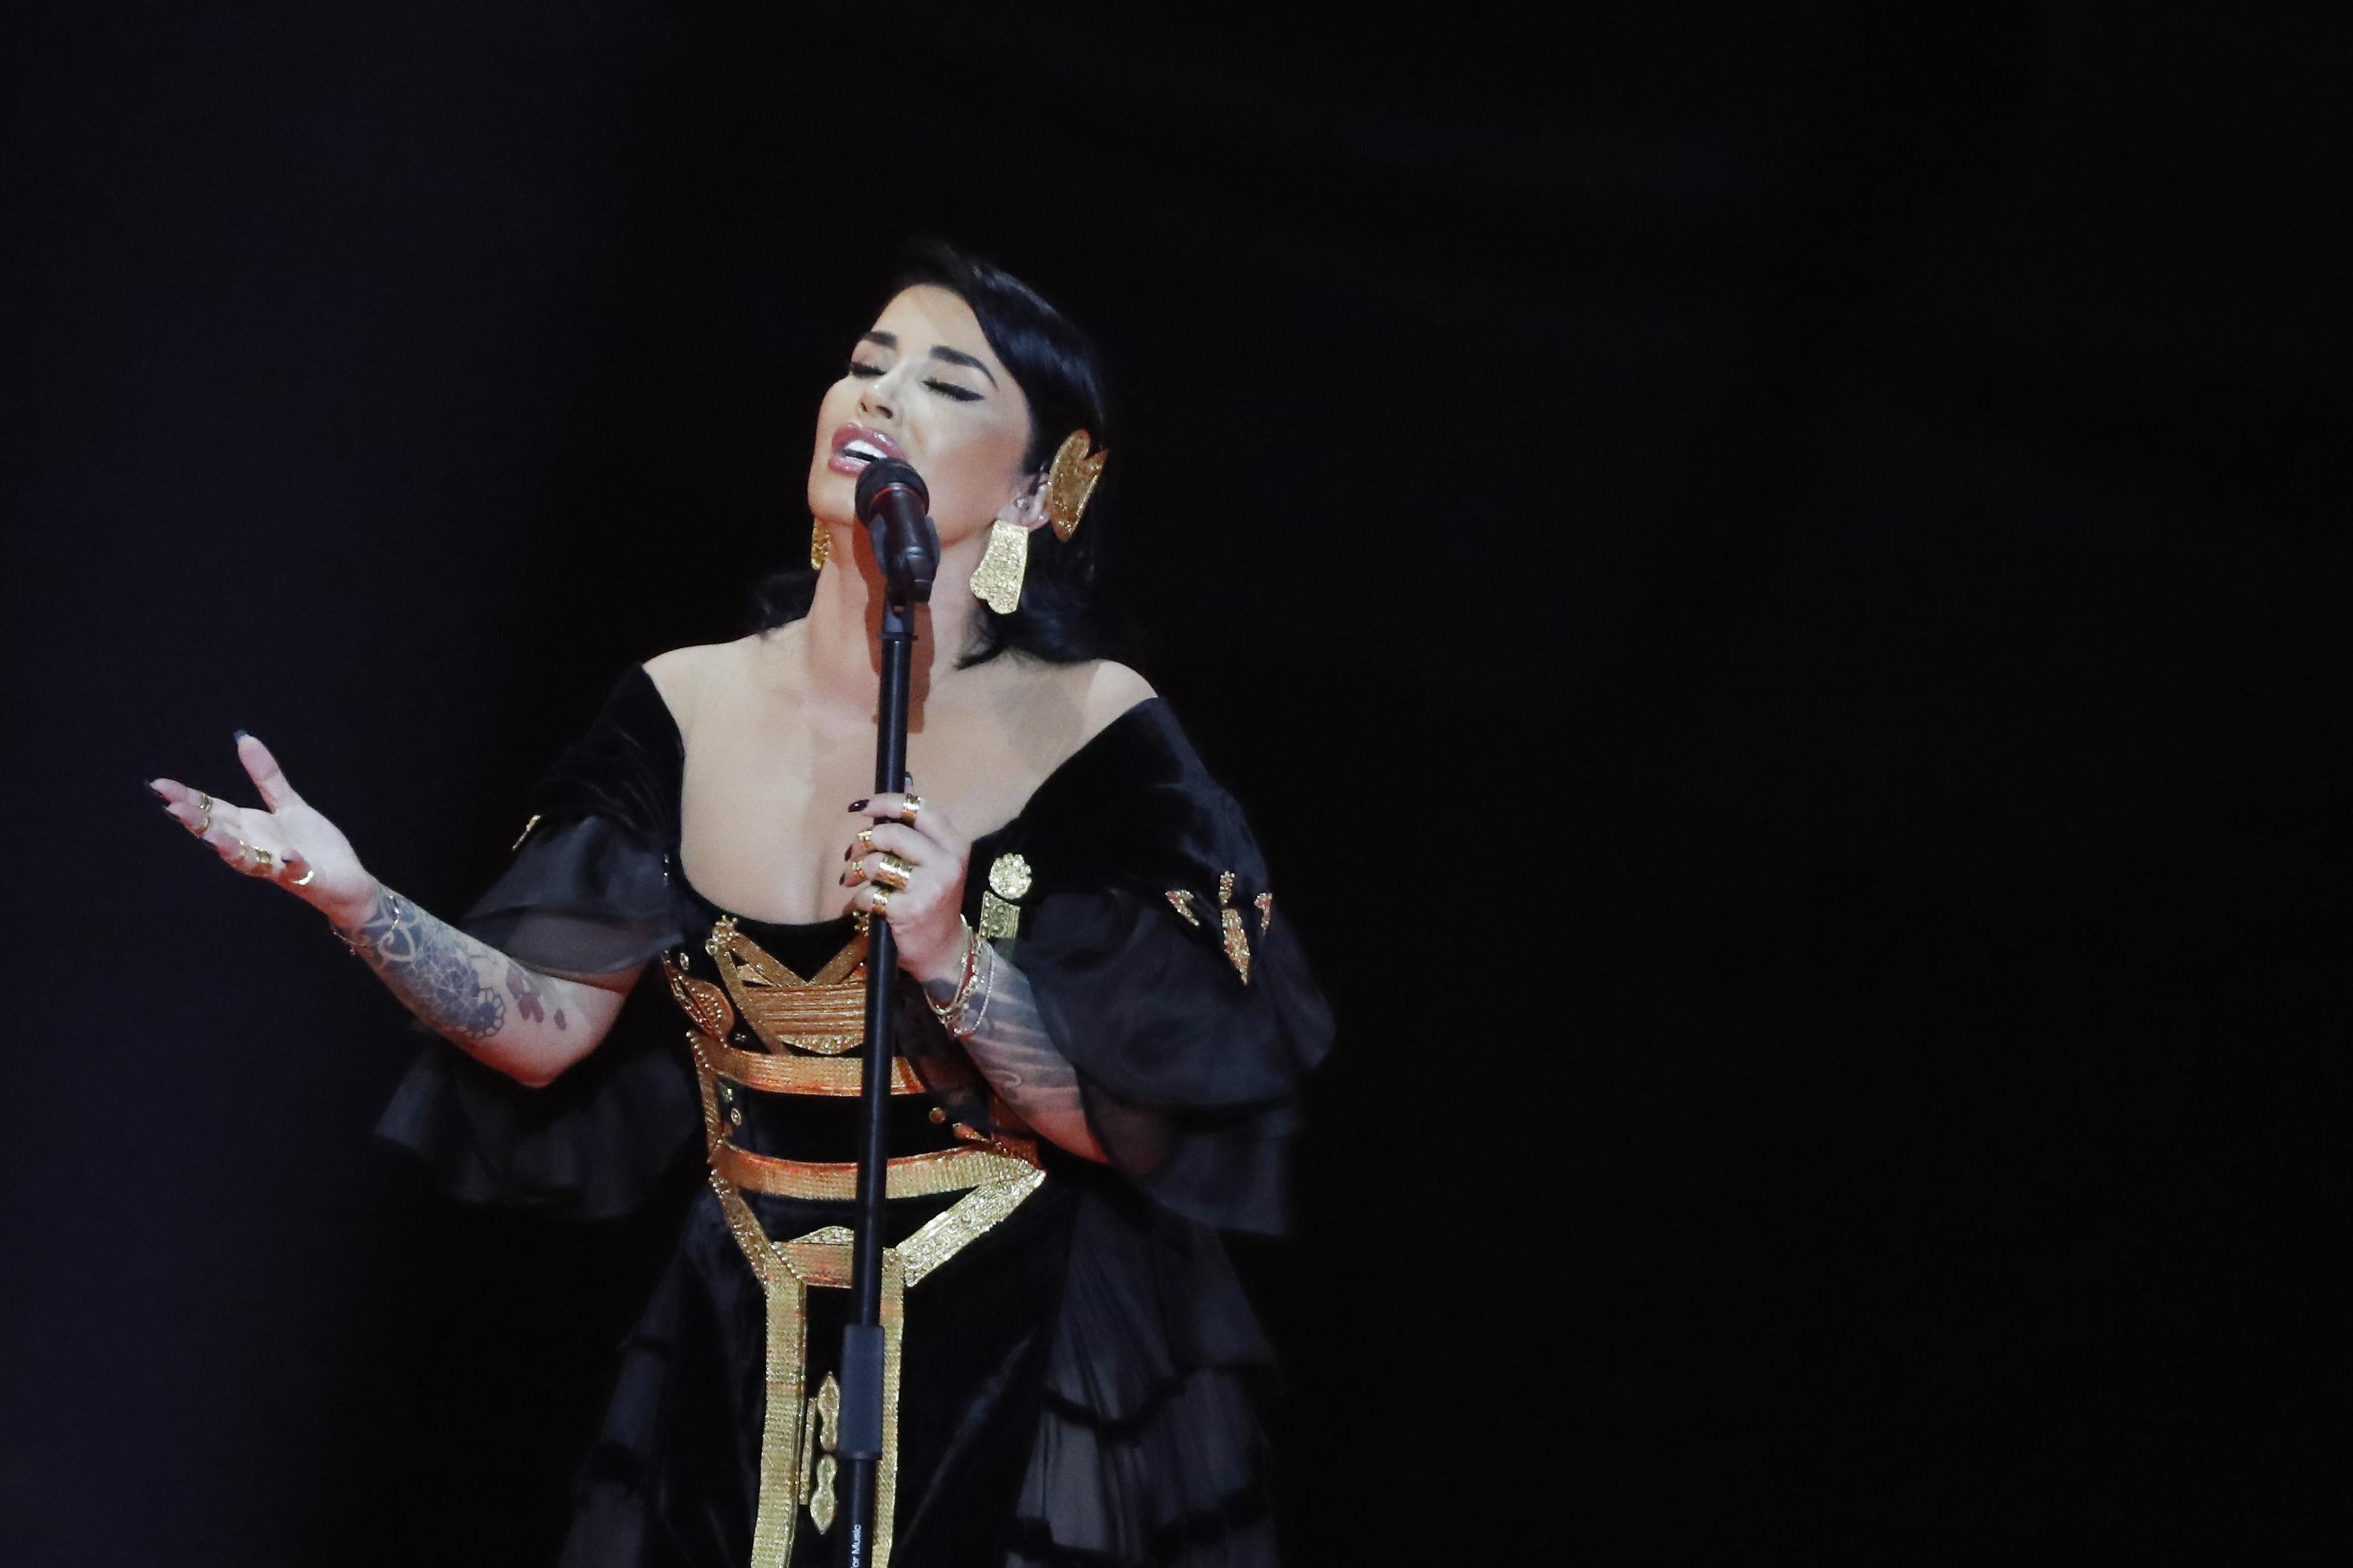 Йонида Малики, Албания